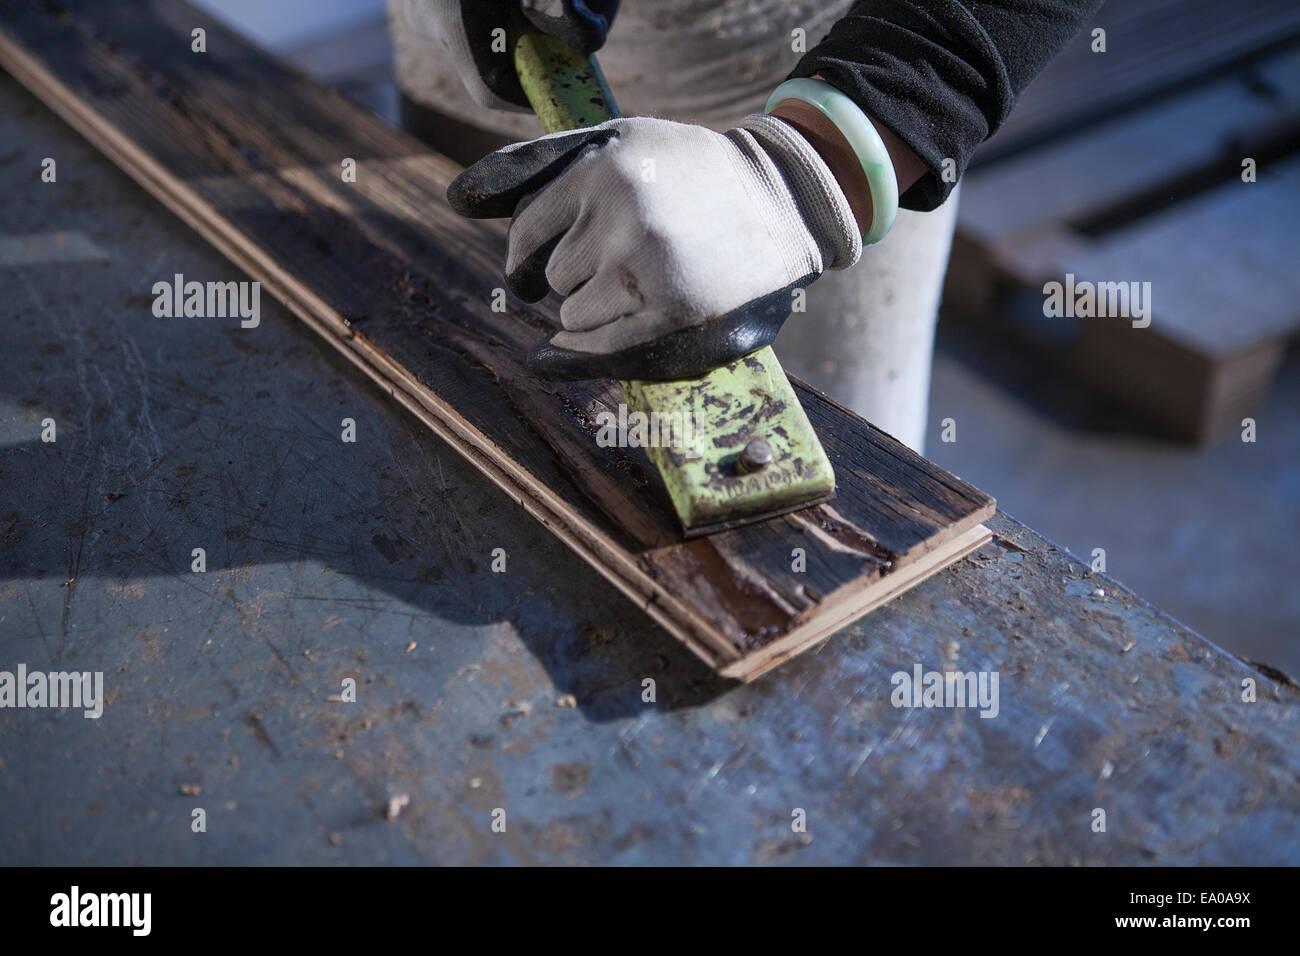 Carpenter working on wood plank in factory, Jiangsu, China - Stock Image